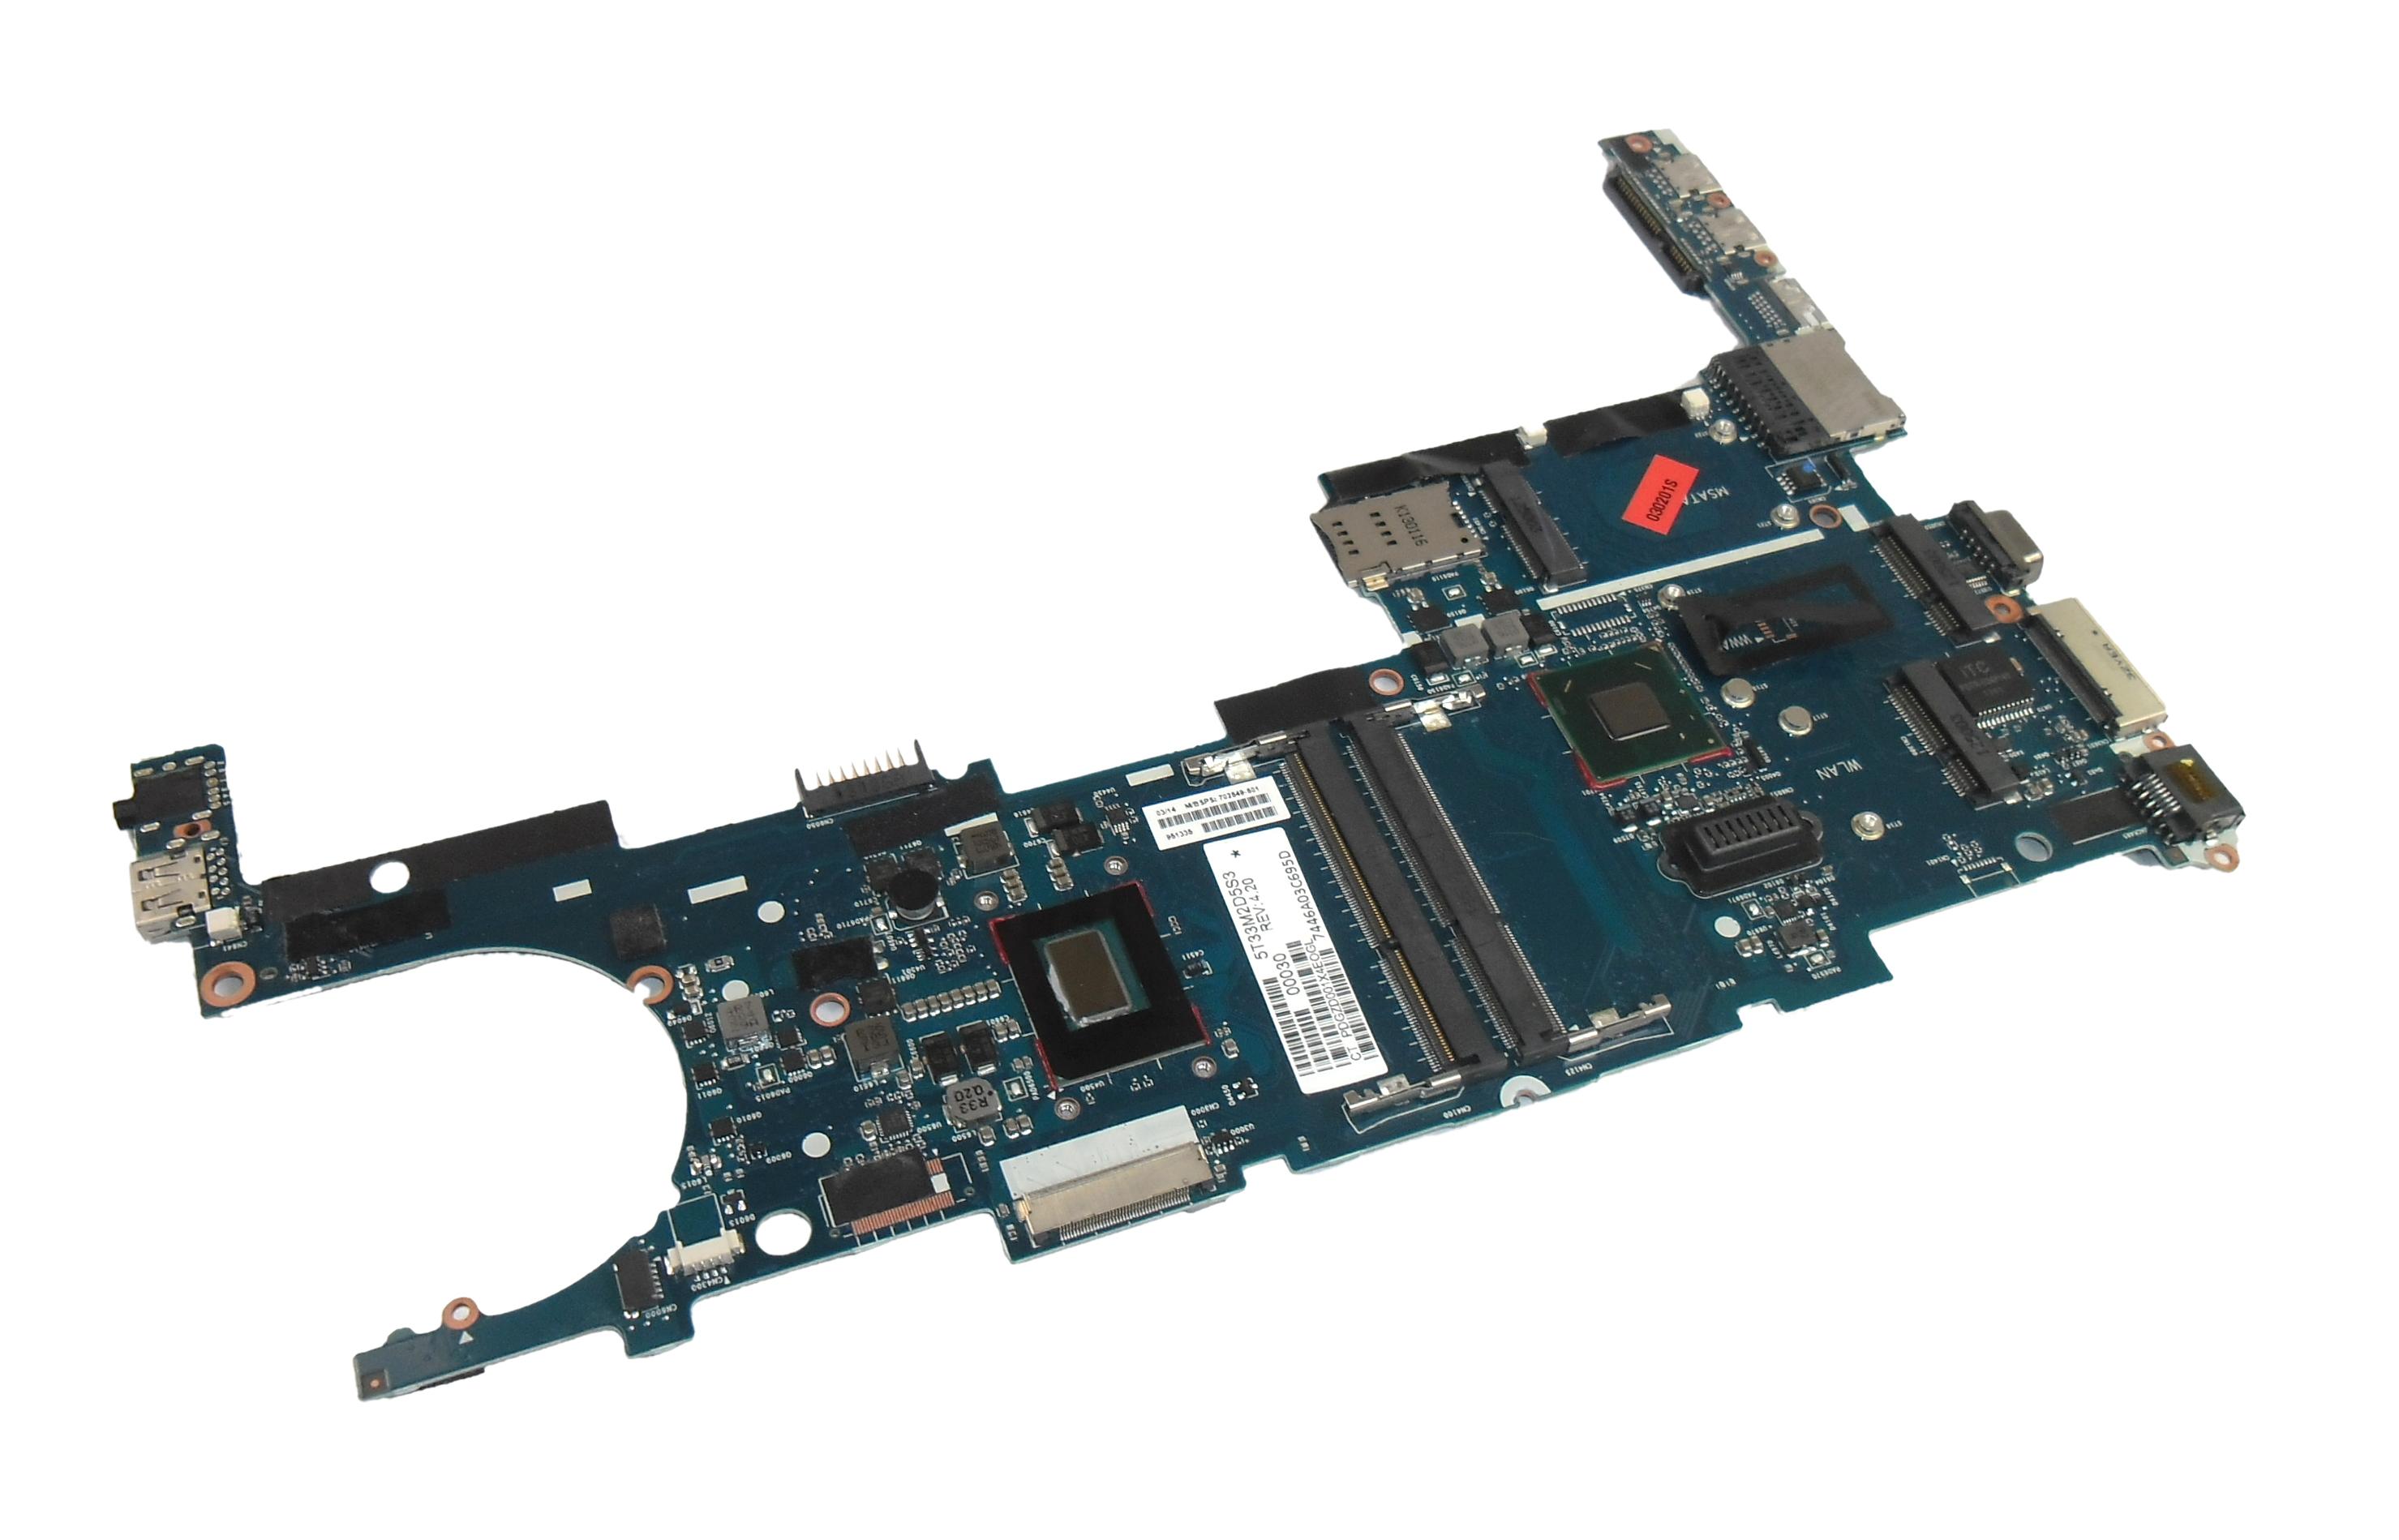 HP 702849-001 EliteBook Folio 9470m Motherboard with i5-3427U (SR0N7) Processor